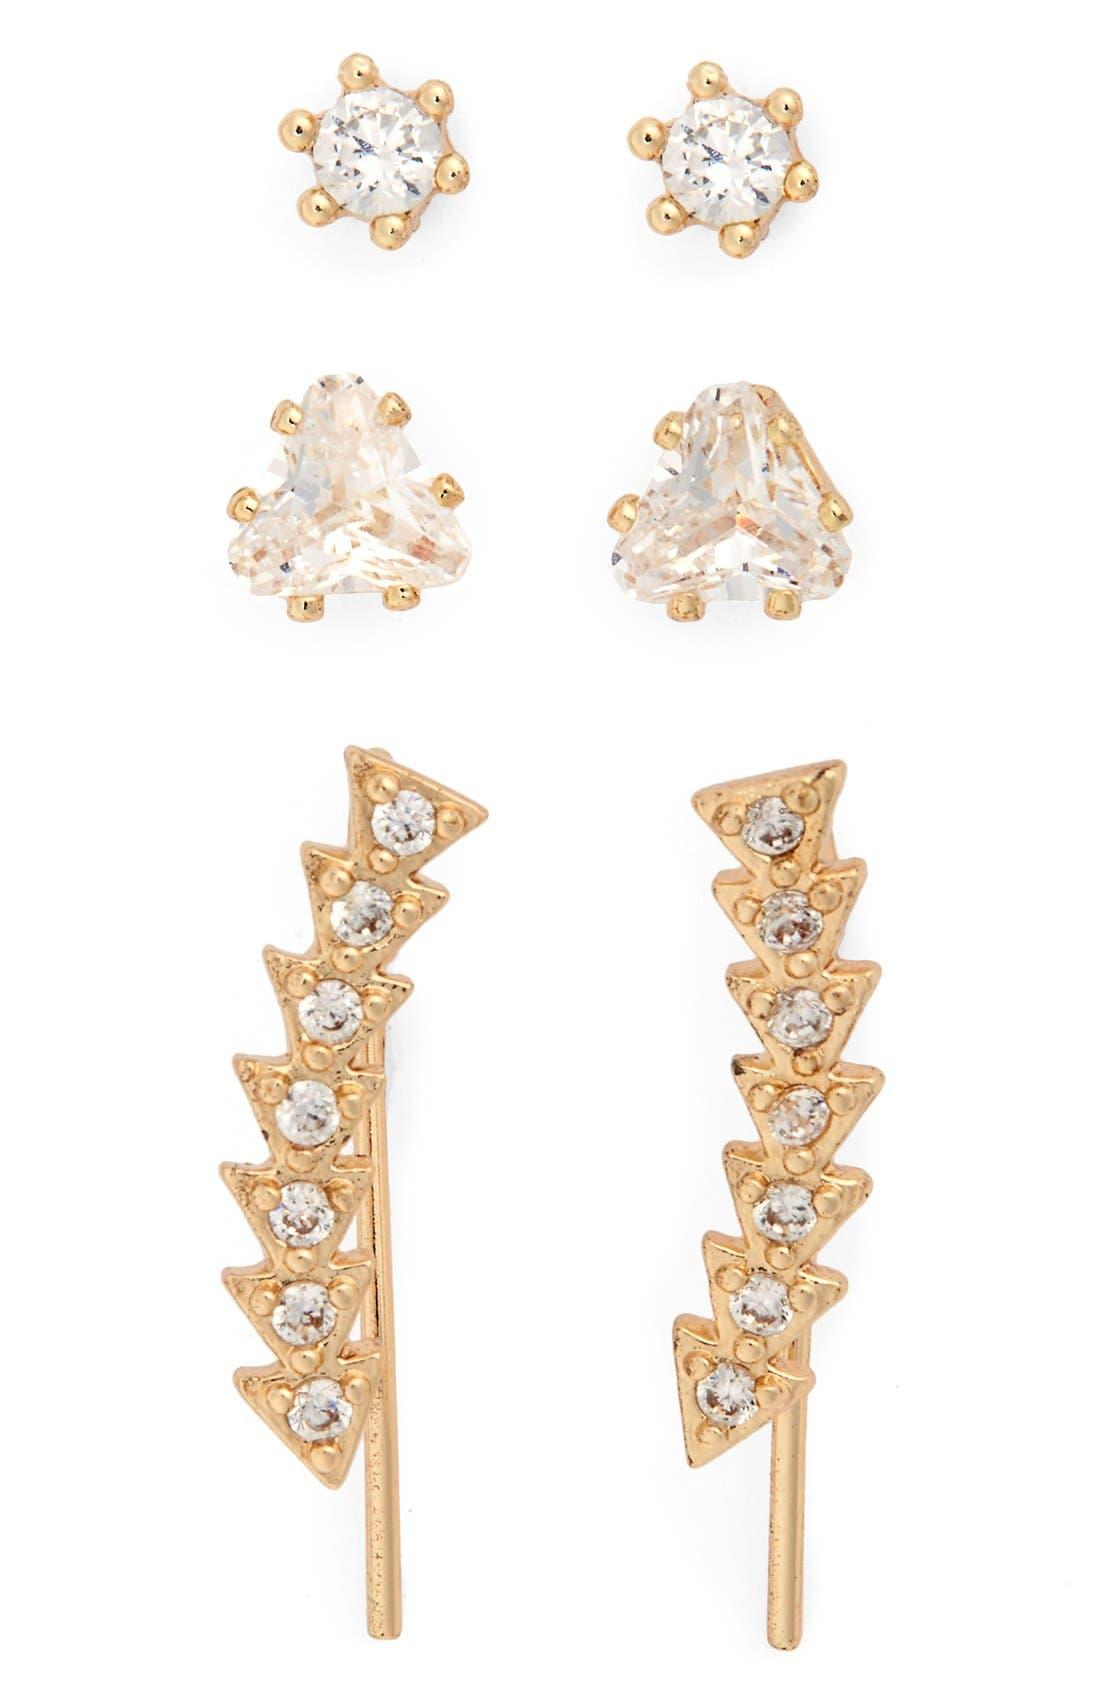 Main Image - Loren Olivia Crystal Stud Earrings & Ear Crawlers (Set of 3)